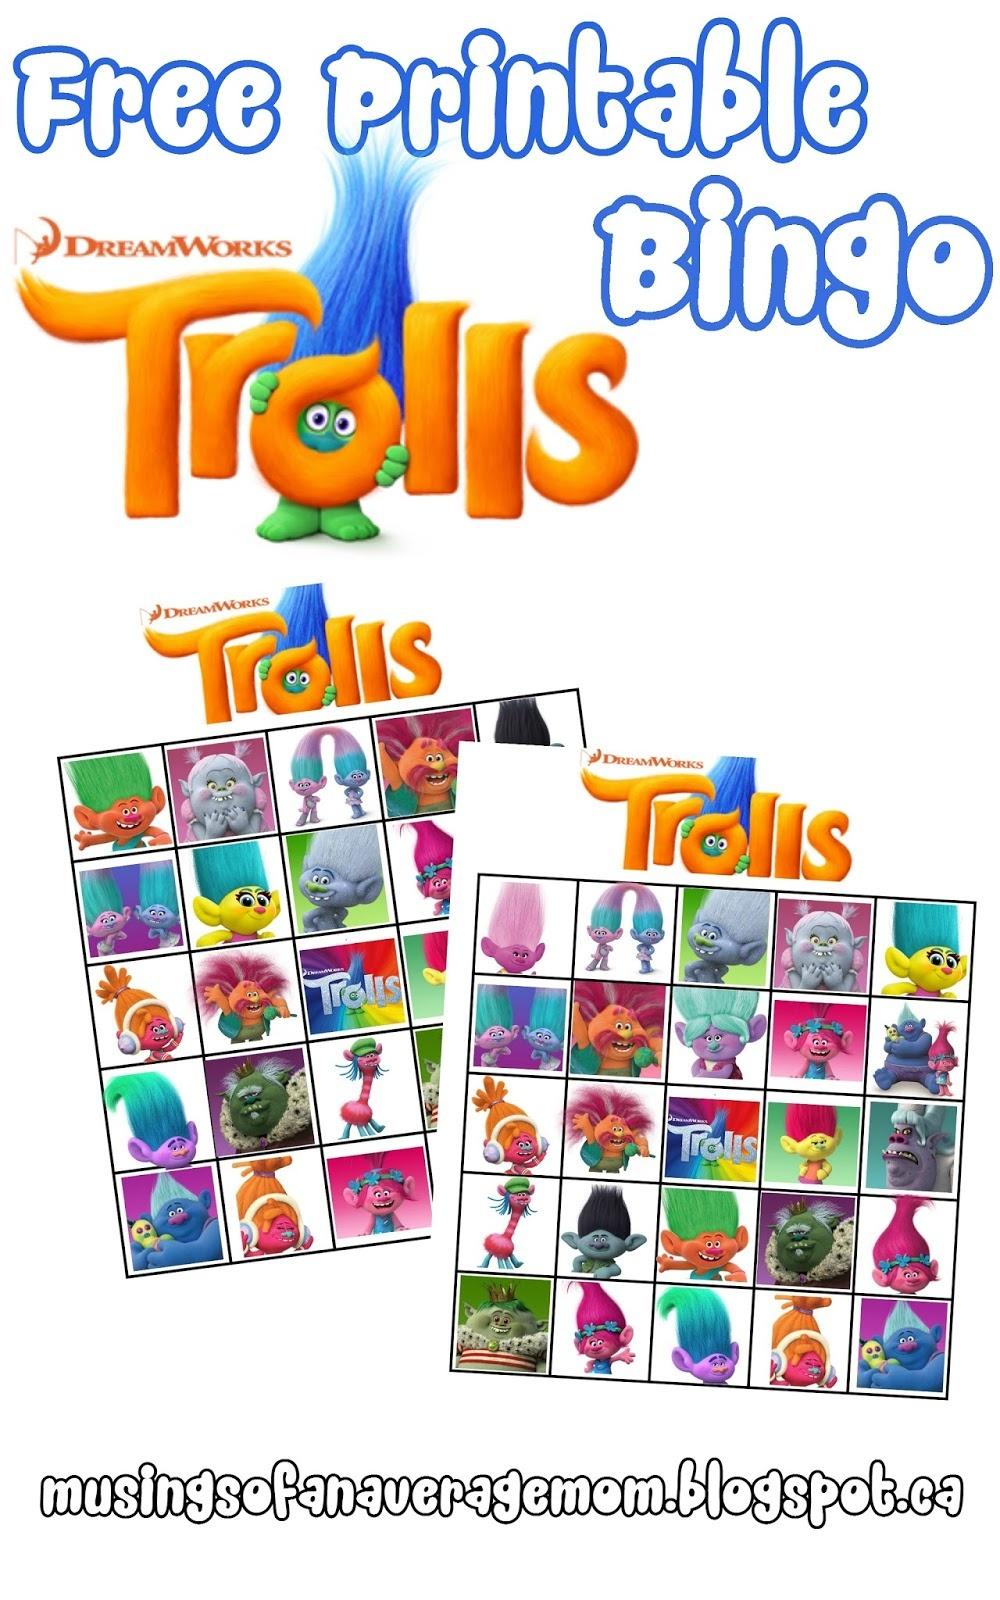 Musings Of An Average Mom: Free Printable Trolls Movie Bingo - Free Printable Trolls